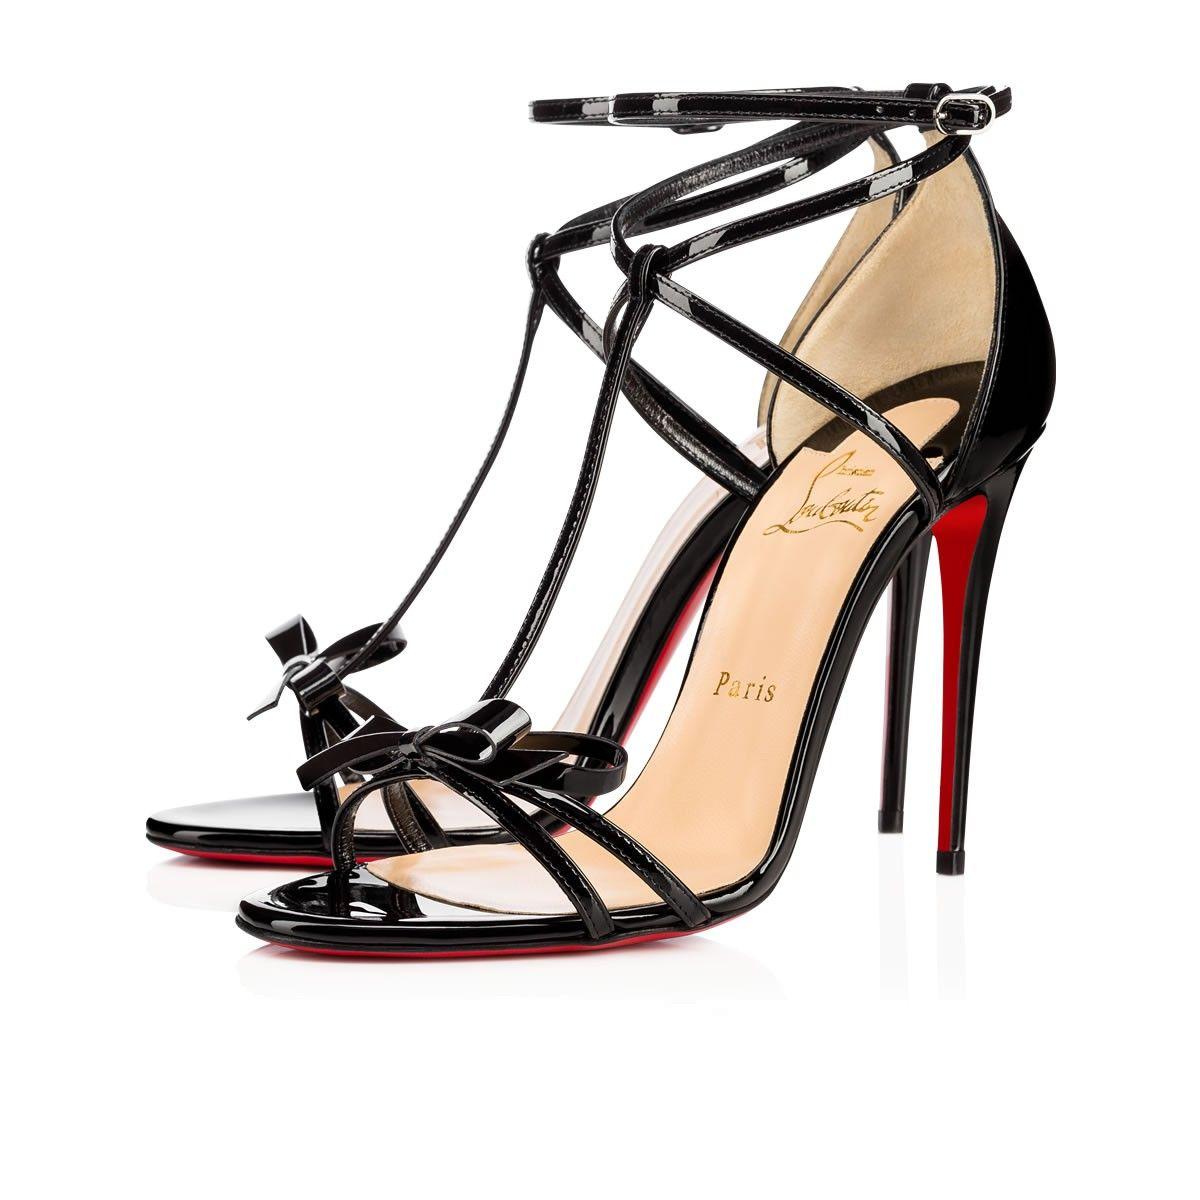 914cc91d6a8f CHRISTIAN LOUBOUTIN Blakissima 100 Black Patent Leather - Women Shoes - Christian  Louboutin.  christianlouboutin  shoes